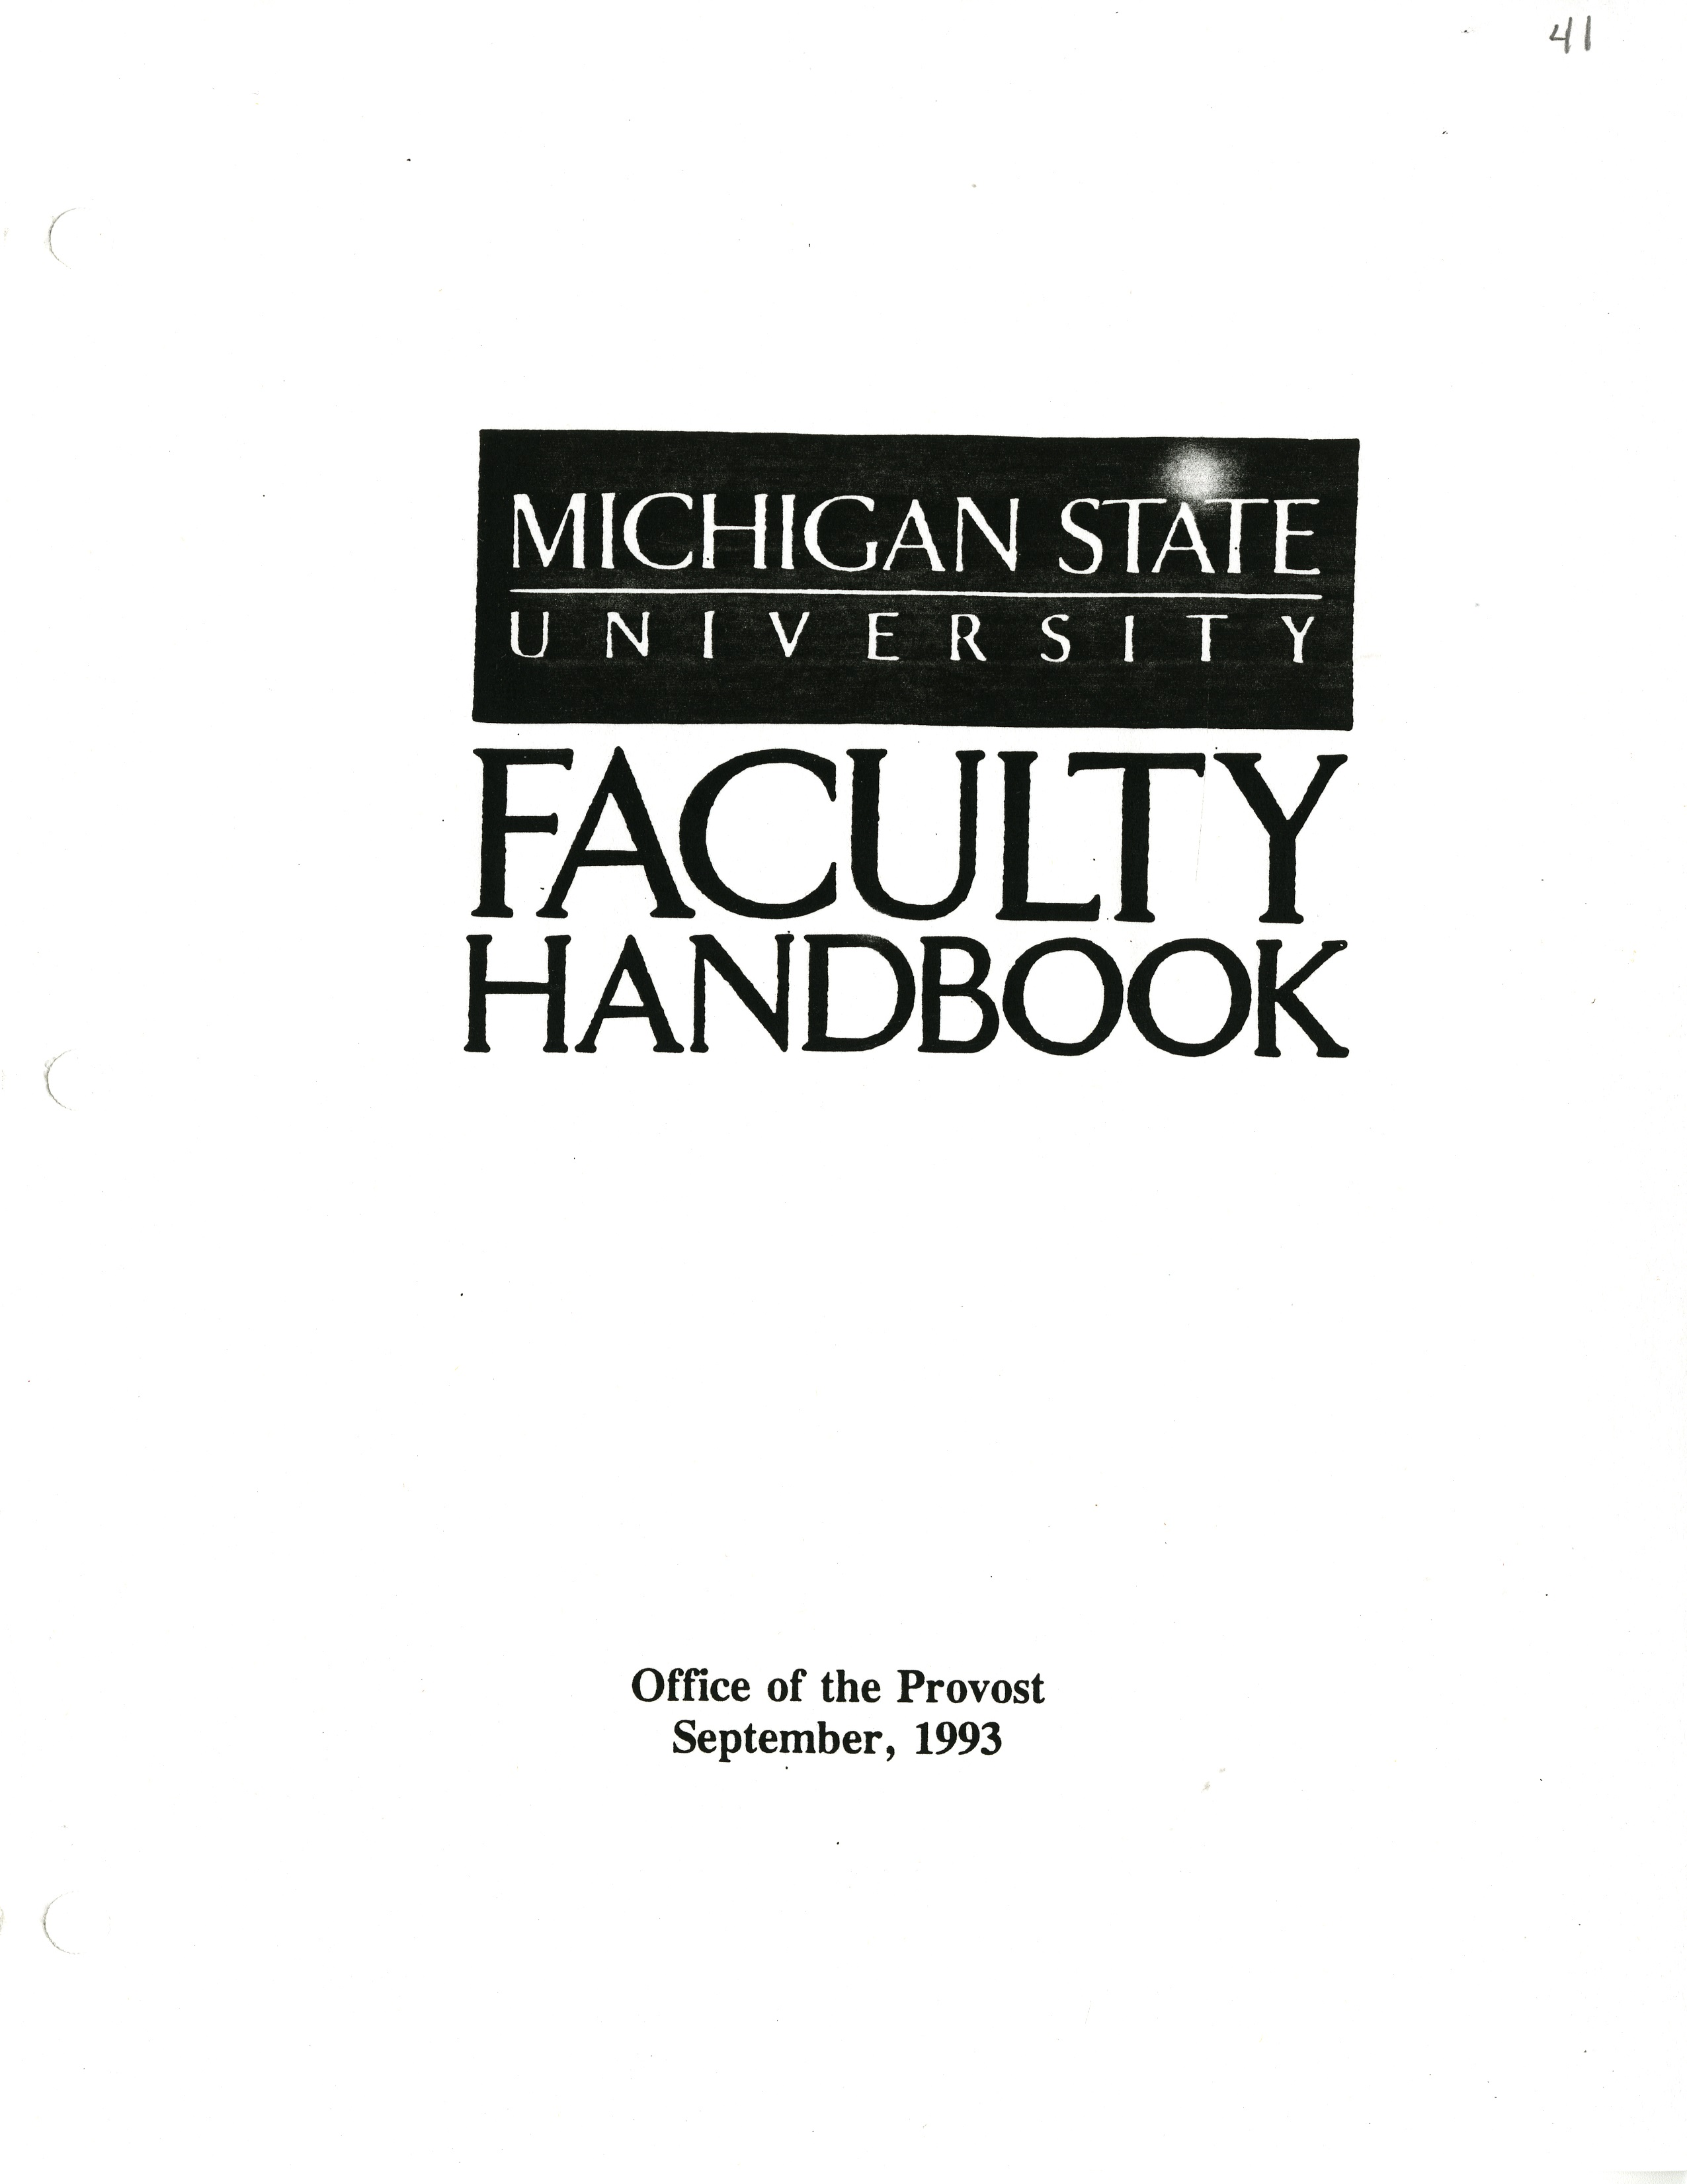 Faculty Handbook, 1993